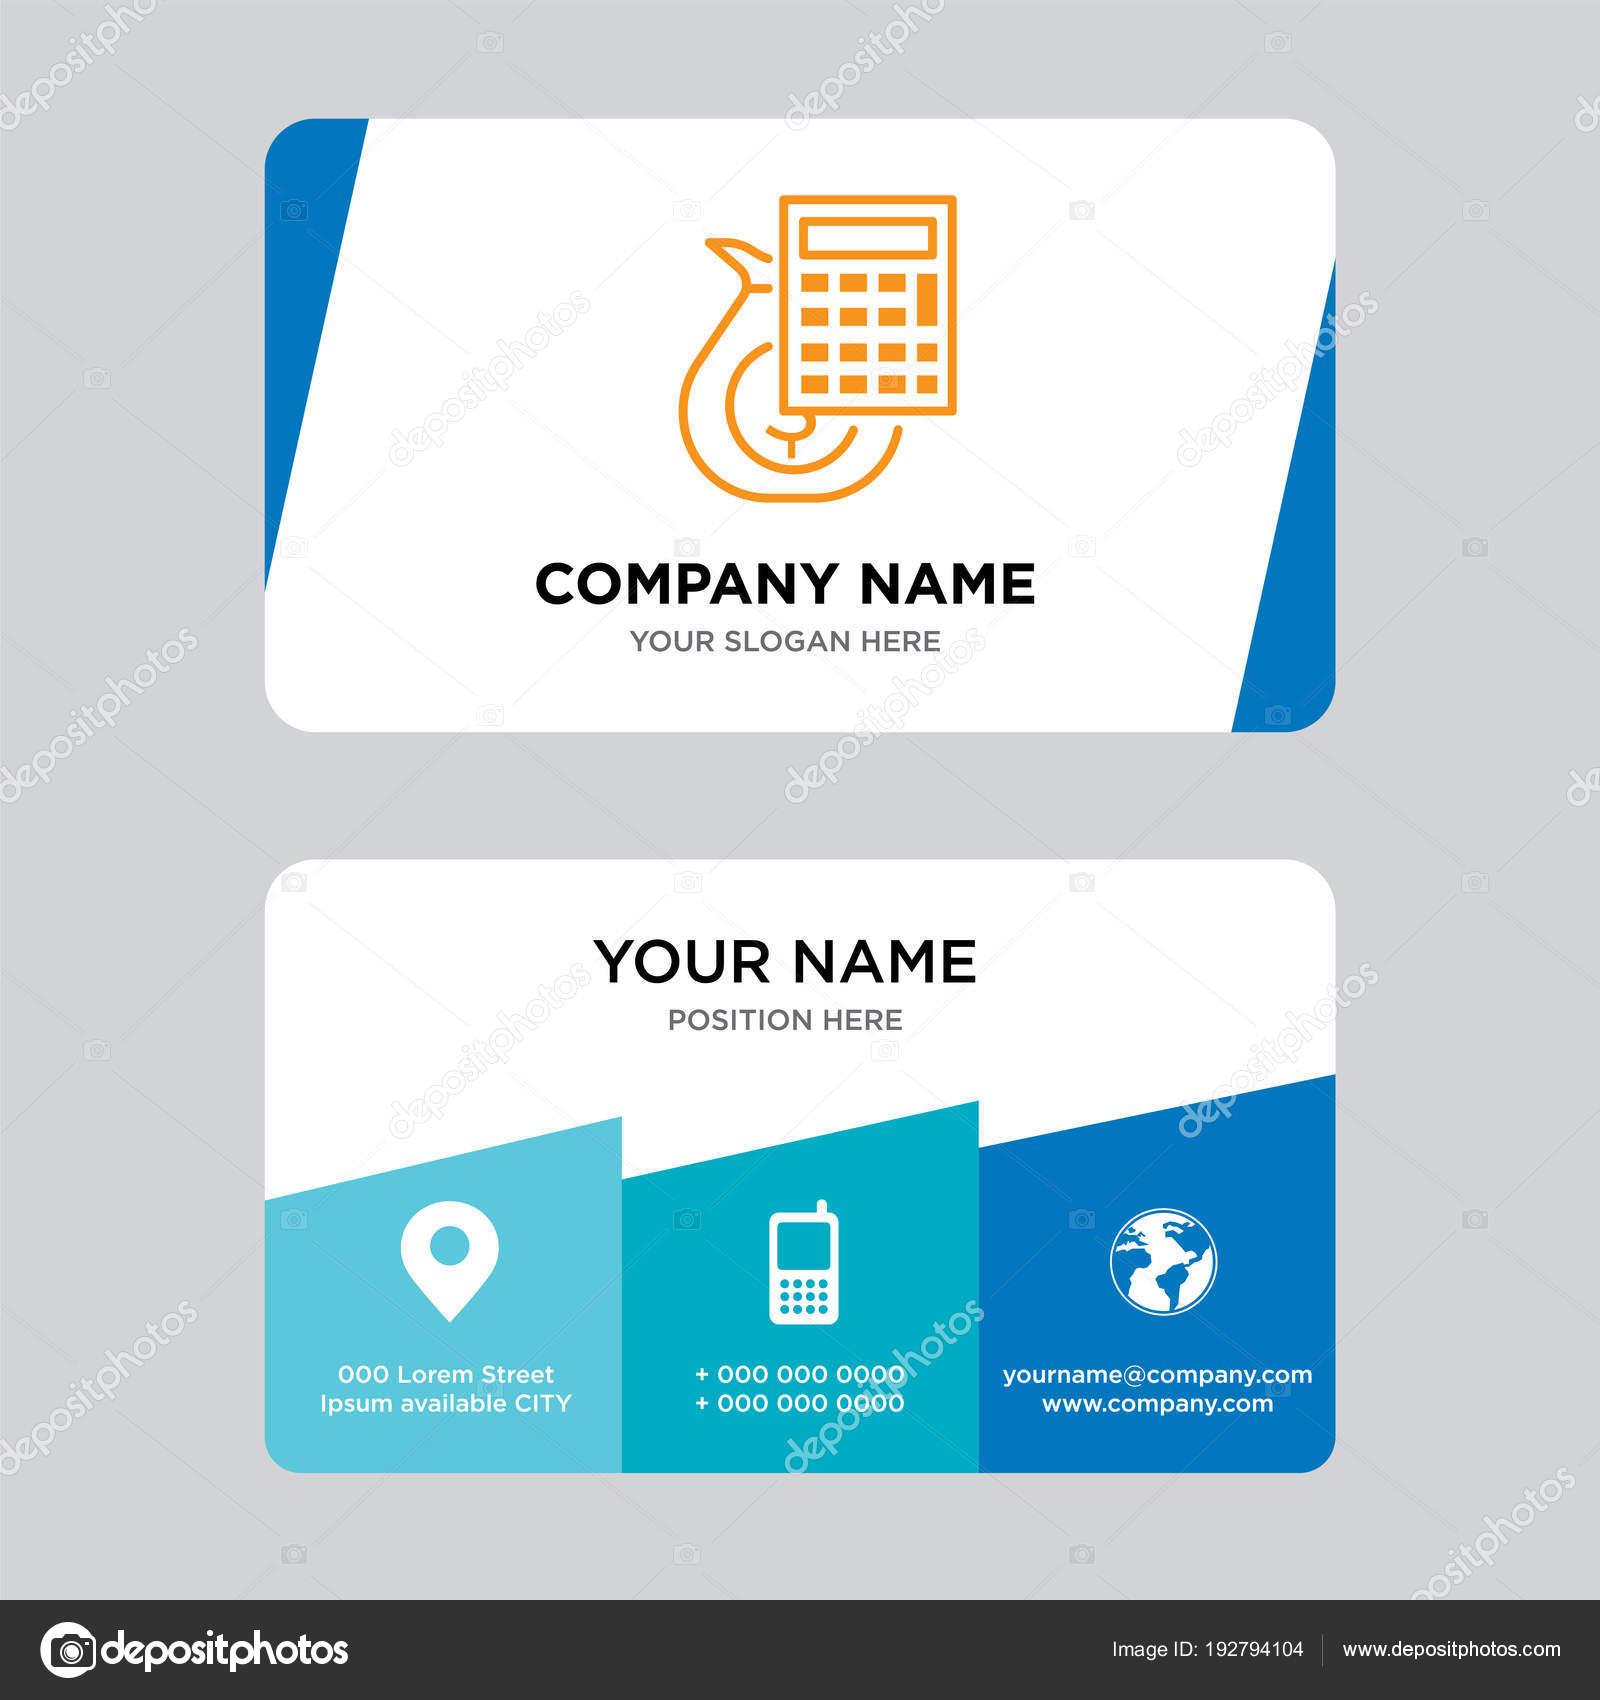 Geld-Rechner-Visitenkarte-Design-Vorlage — Stockvektor ...